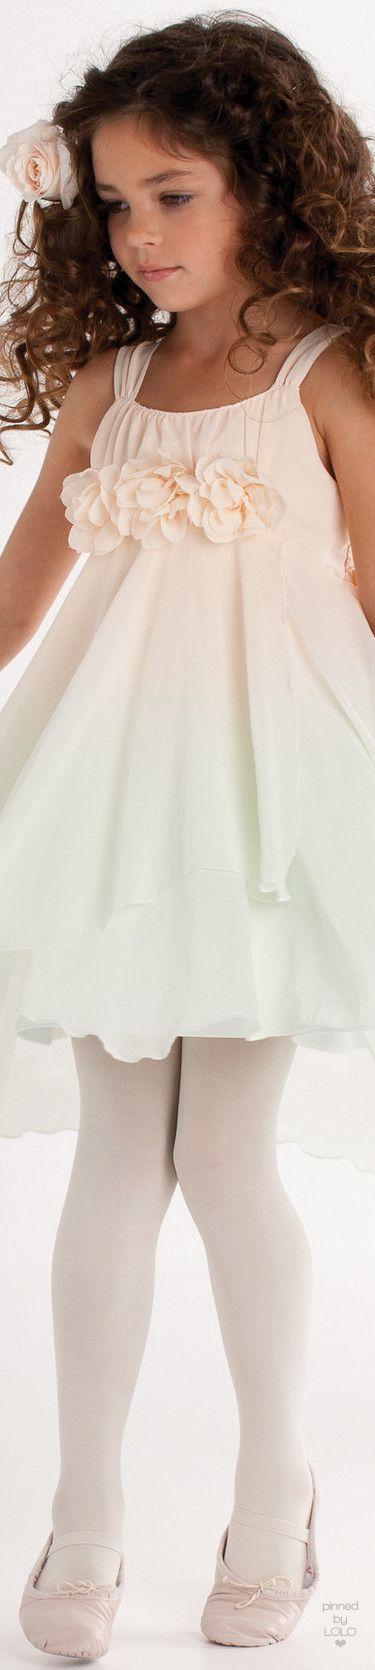 Pastel Dress | LOLO❤︎